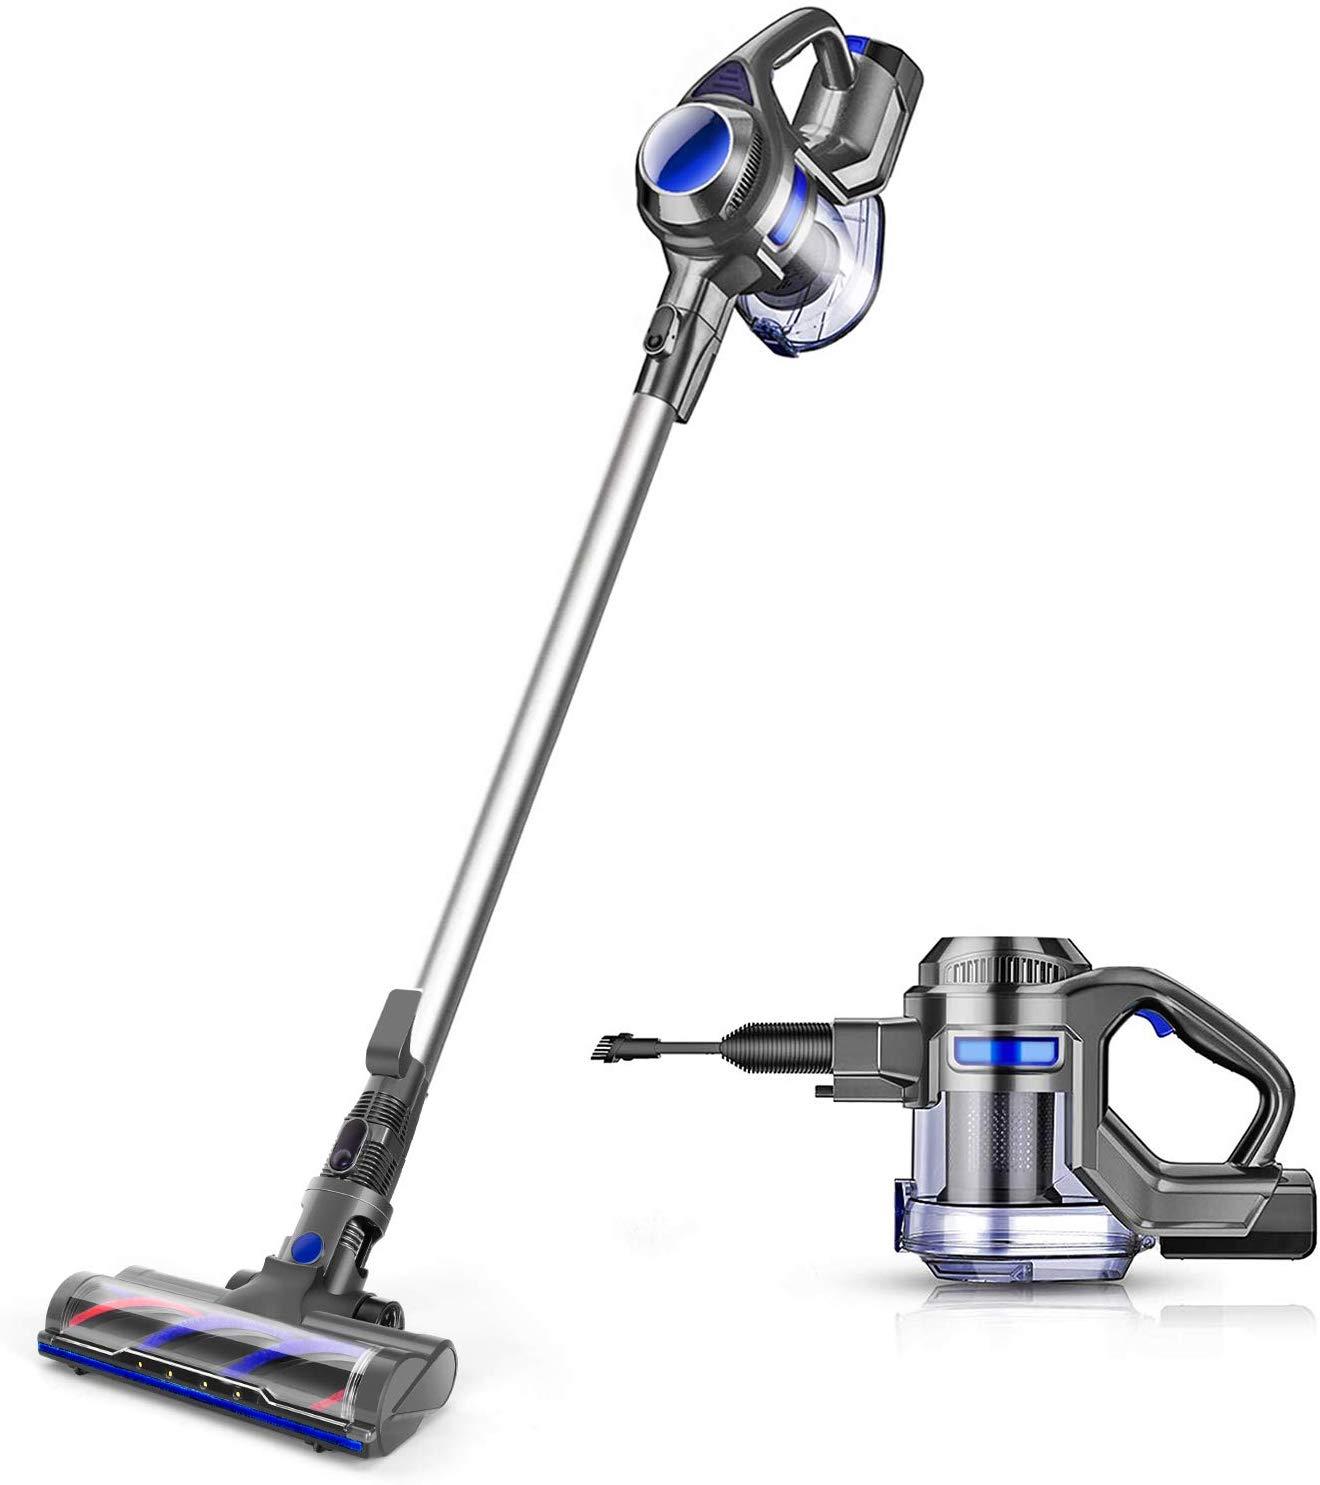 Review of MOOSOO Cordless Handheld Vacuum Cleaner- XL-618A